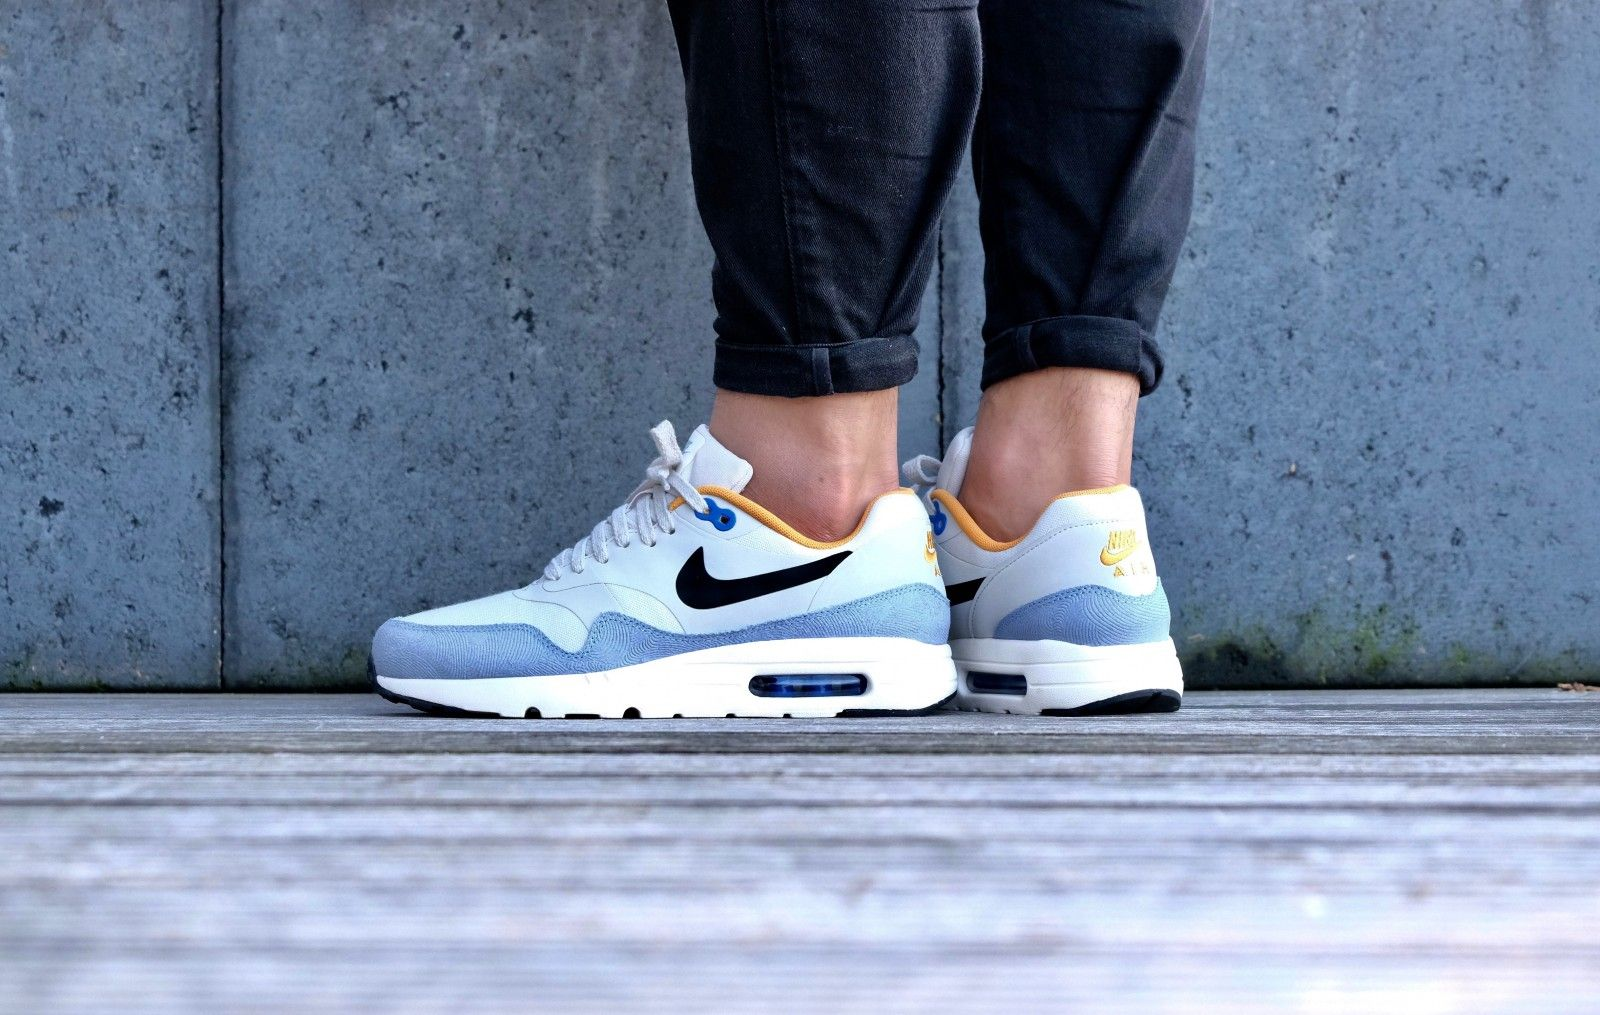 online retailer f9f50 b85a1 Nike Air Max 1 Ultra Essential Light Bone Black-Bluecap-Sail - 819476